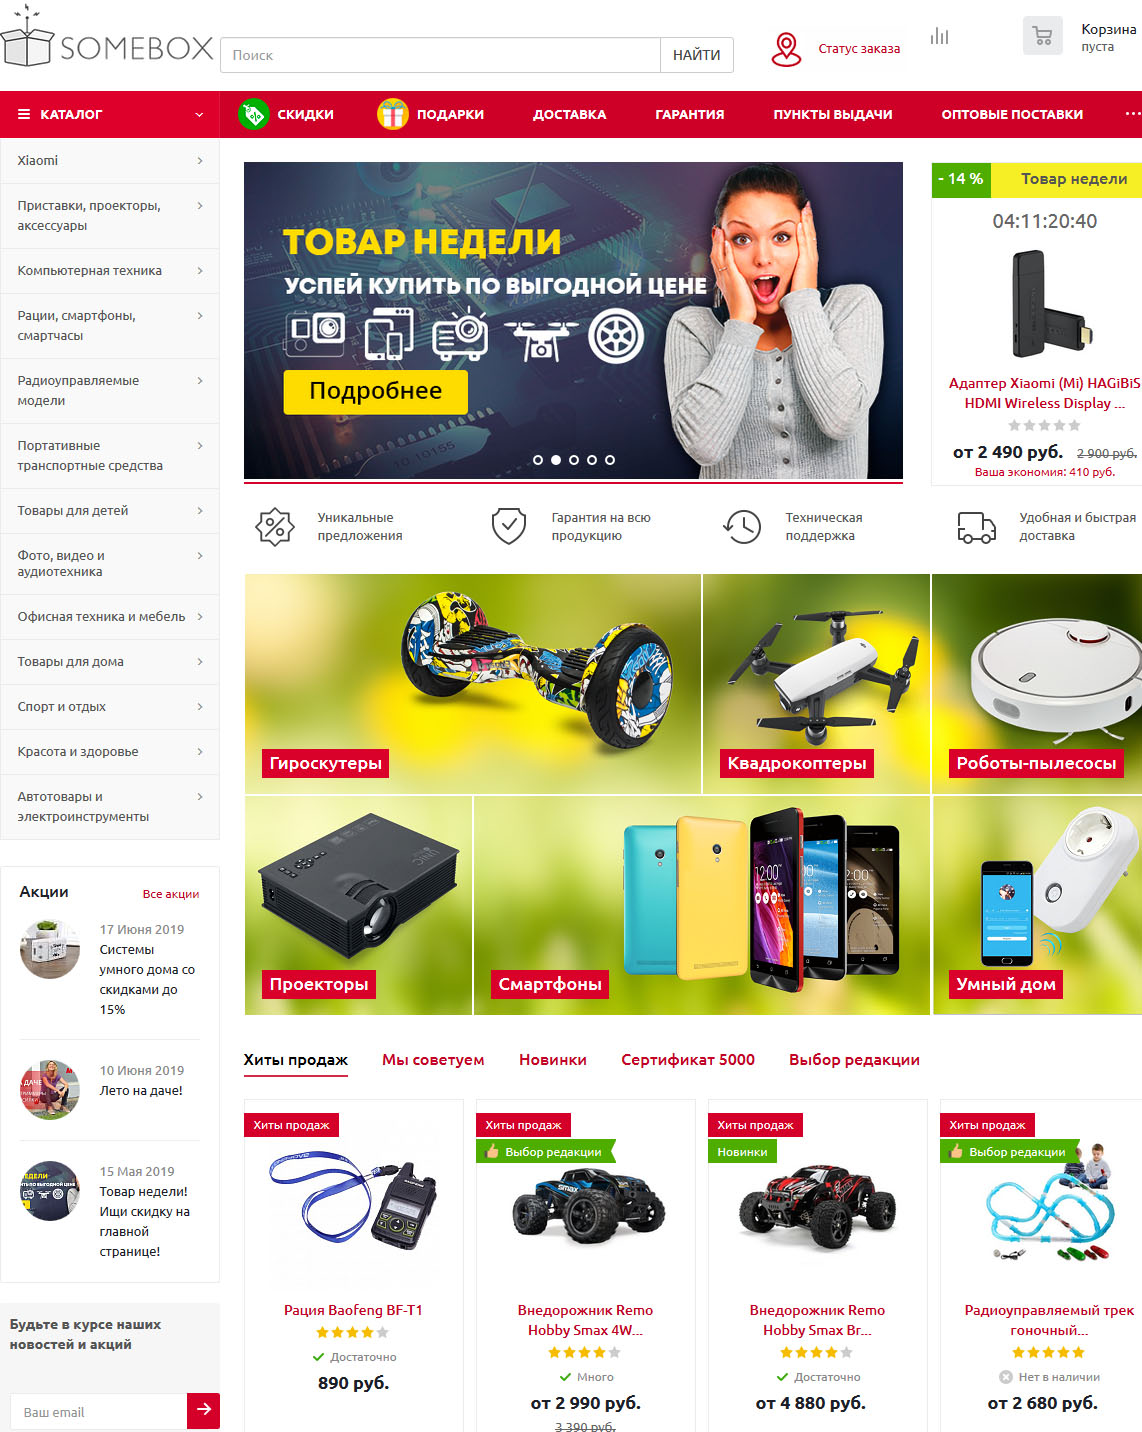 Интернет-магазин Сомебокс